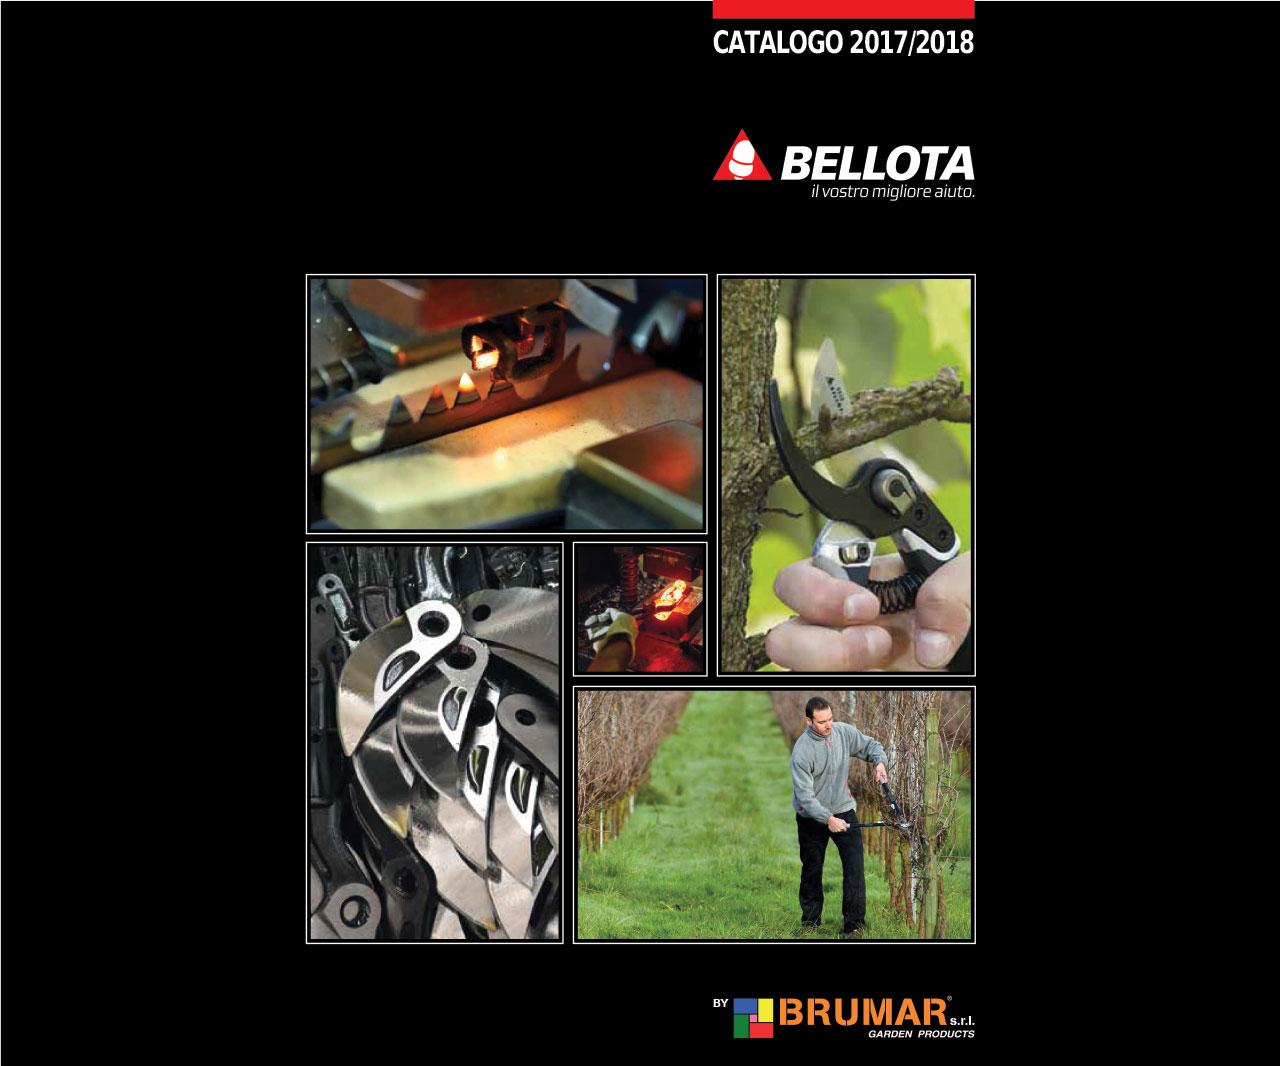 Bellota Accessori 2017